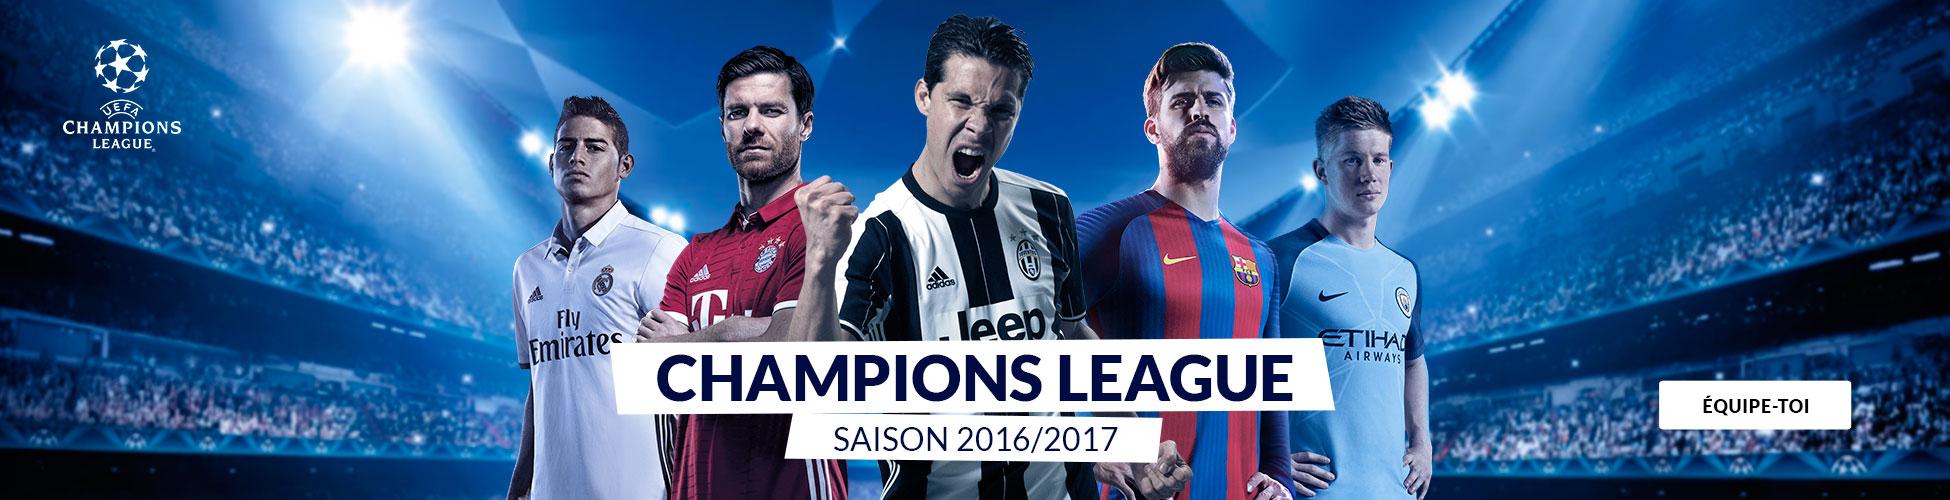 ChampionsLeague Octubre2016 FR